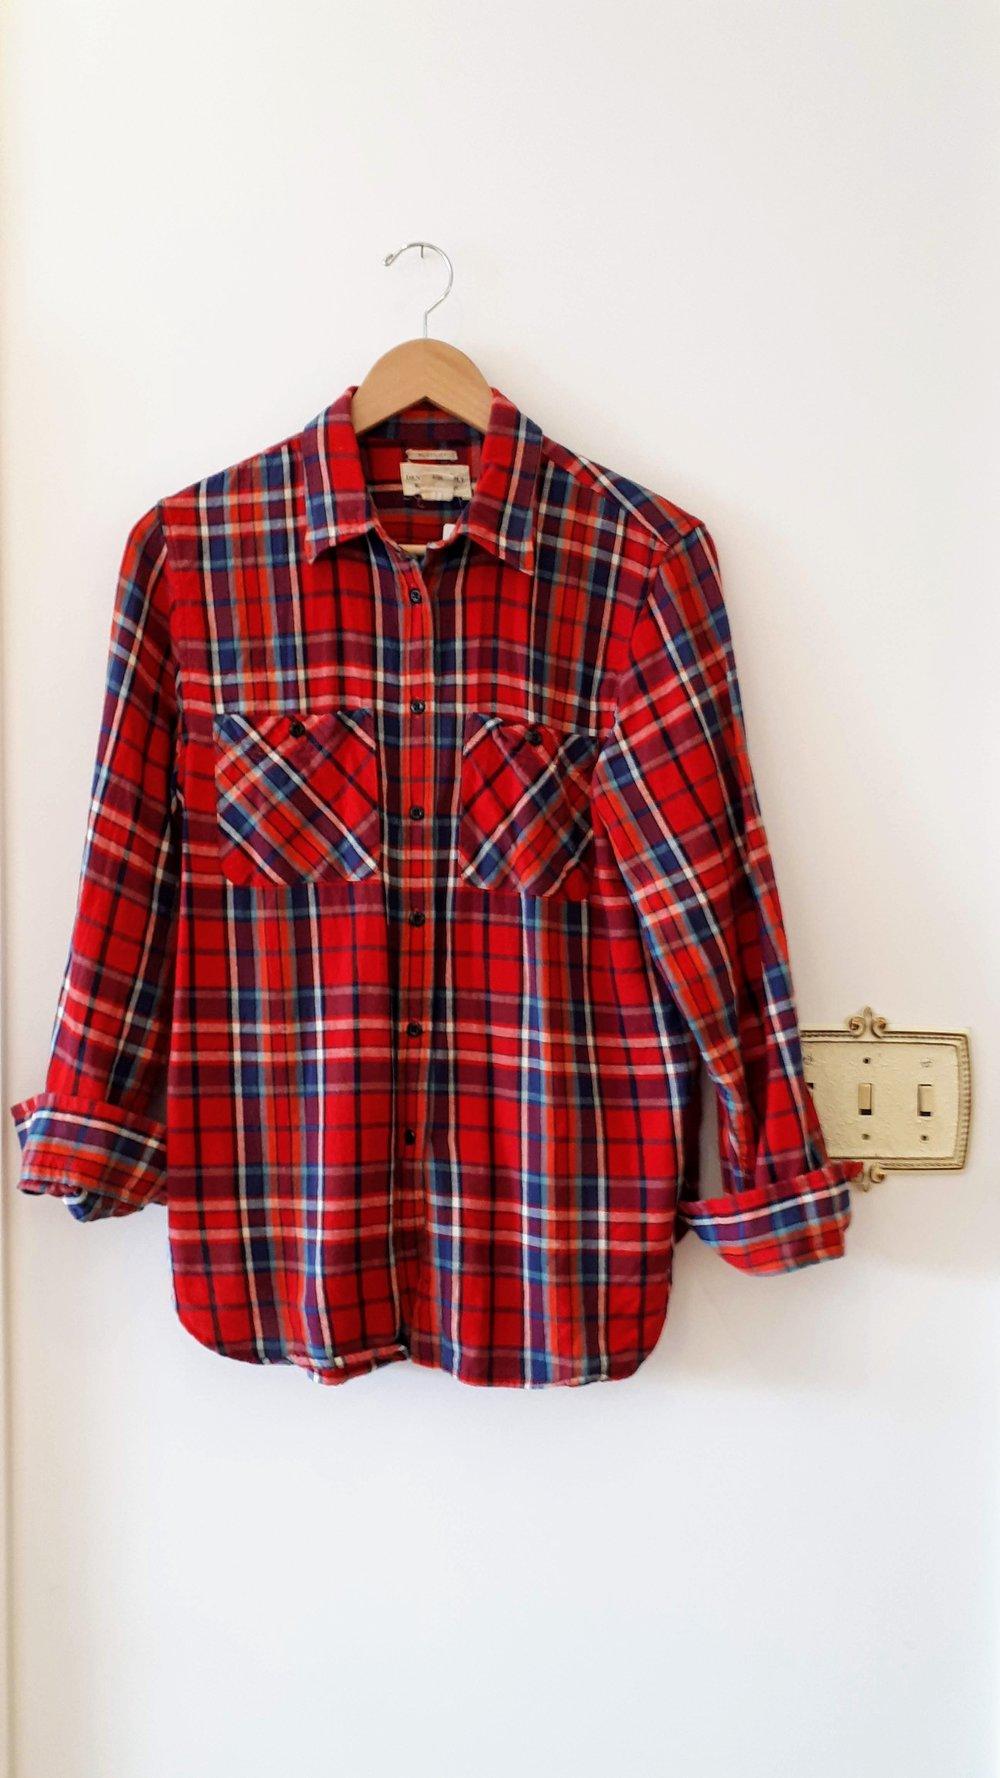 Ralph Lauren top; Size L, $24